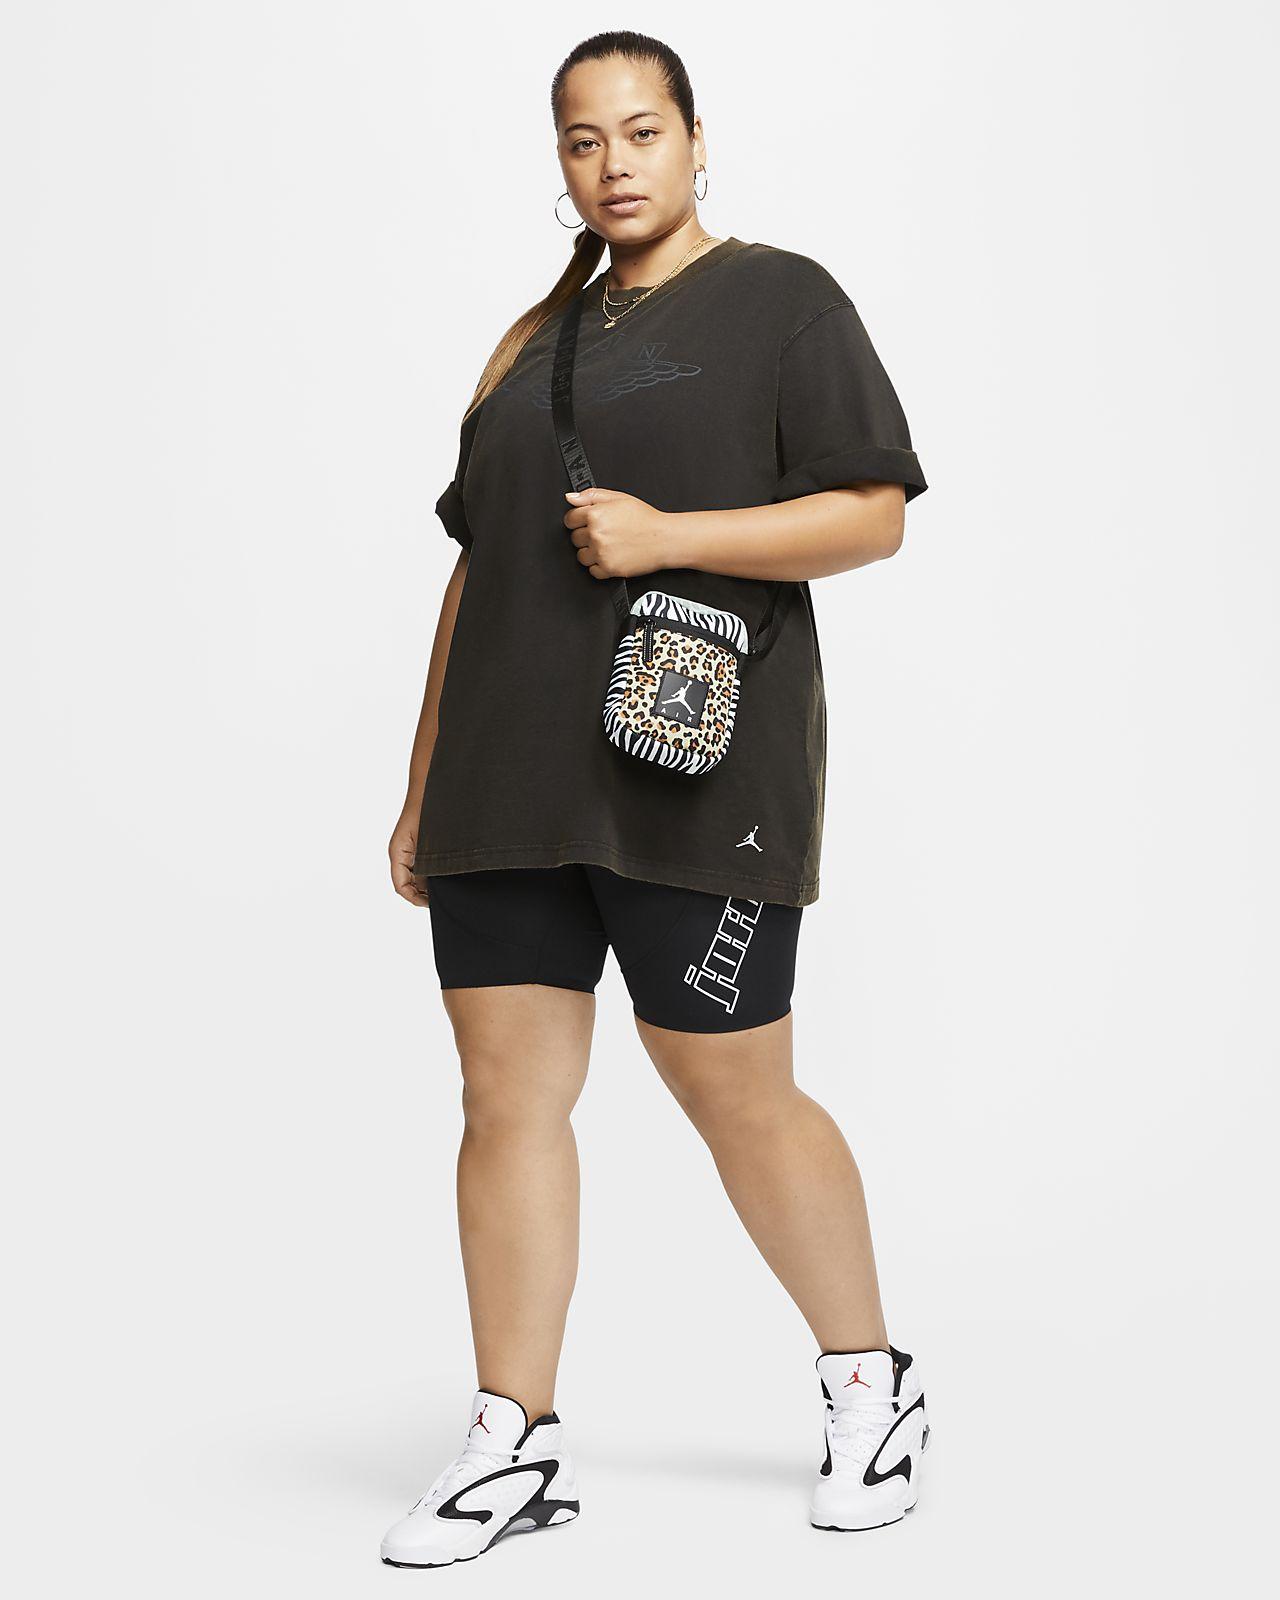 Women Girls Plus Size Print Bike Shirt Short Sleeve T Shirt Blouse Tops